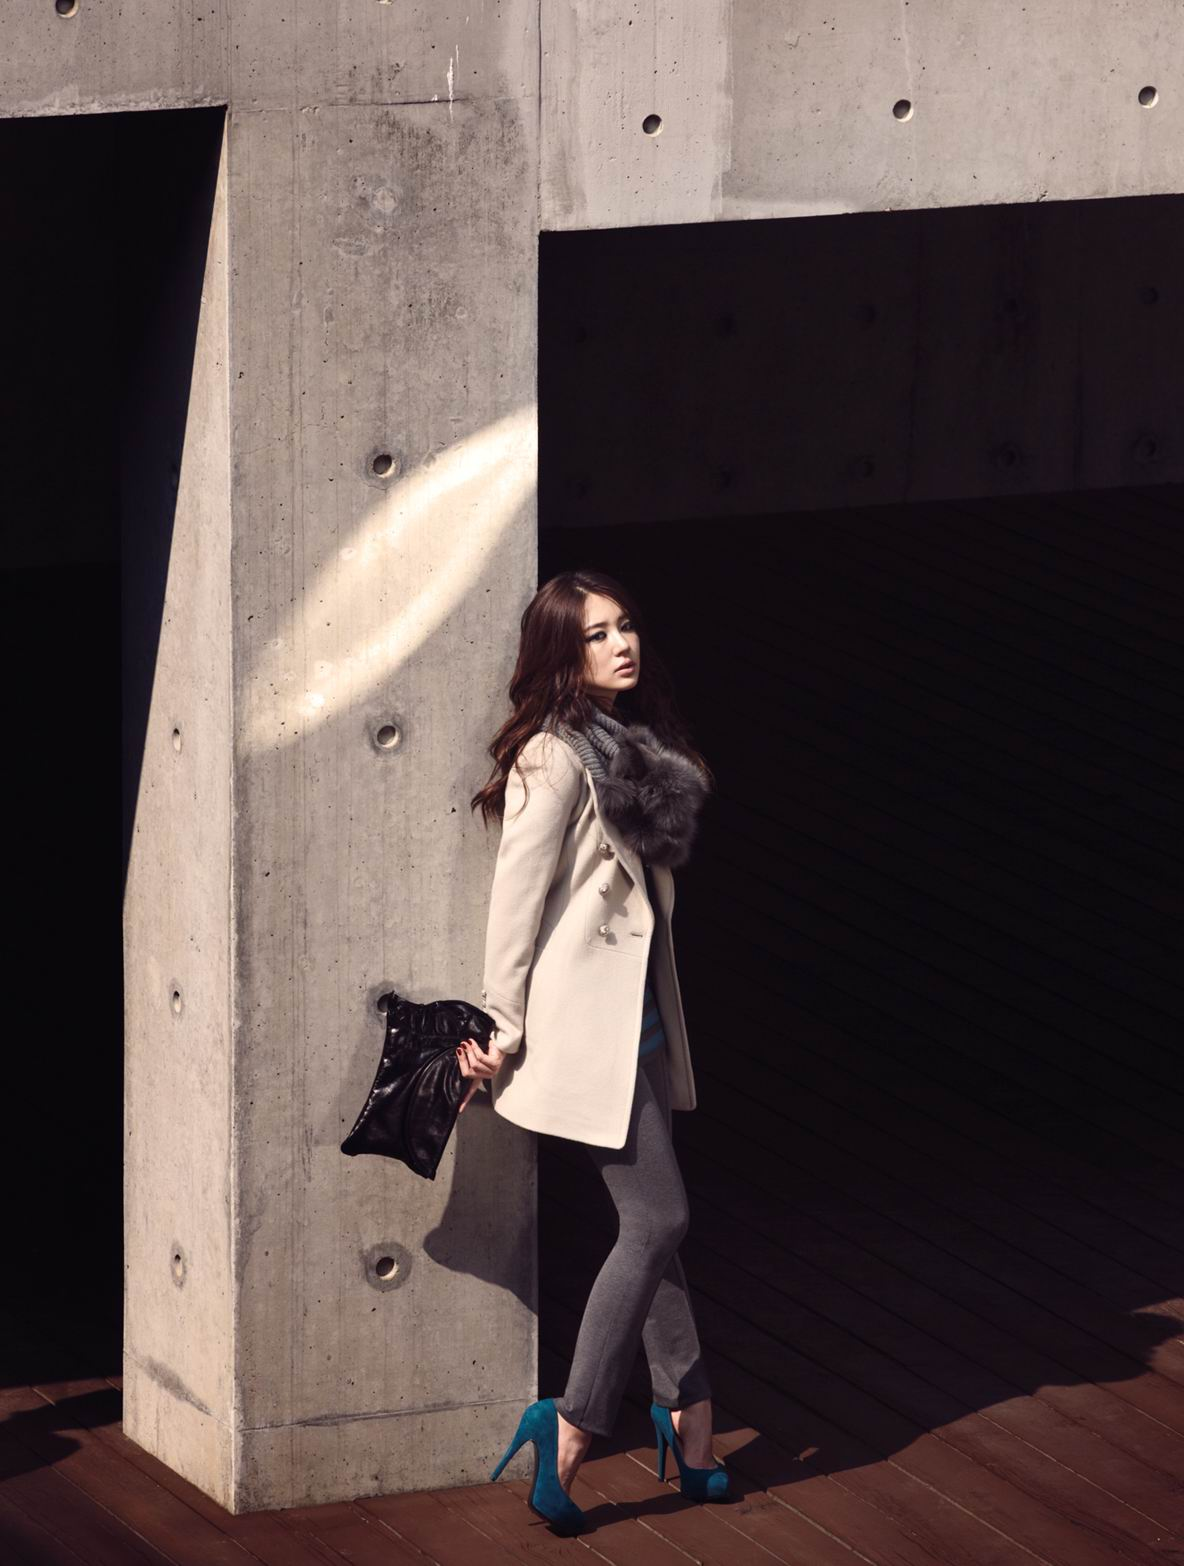 http://1.bp.blogspot.com/_csAyGOQxFJQ/TM5bvehfkCI/AAAAAAAALaA/rn0KdrtCdNg/s1600/cutekimchi.com_YoonEunHye-1-10.jpg